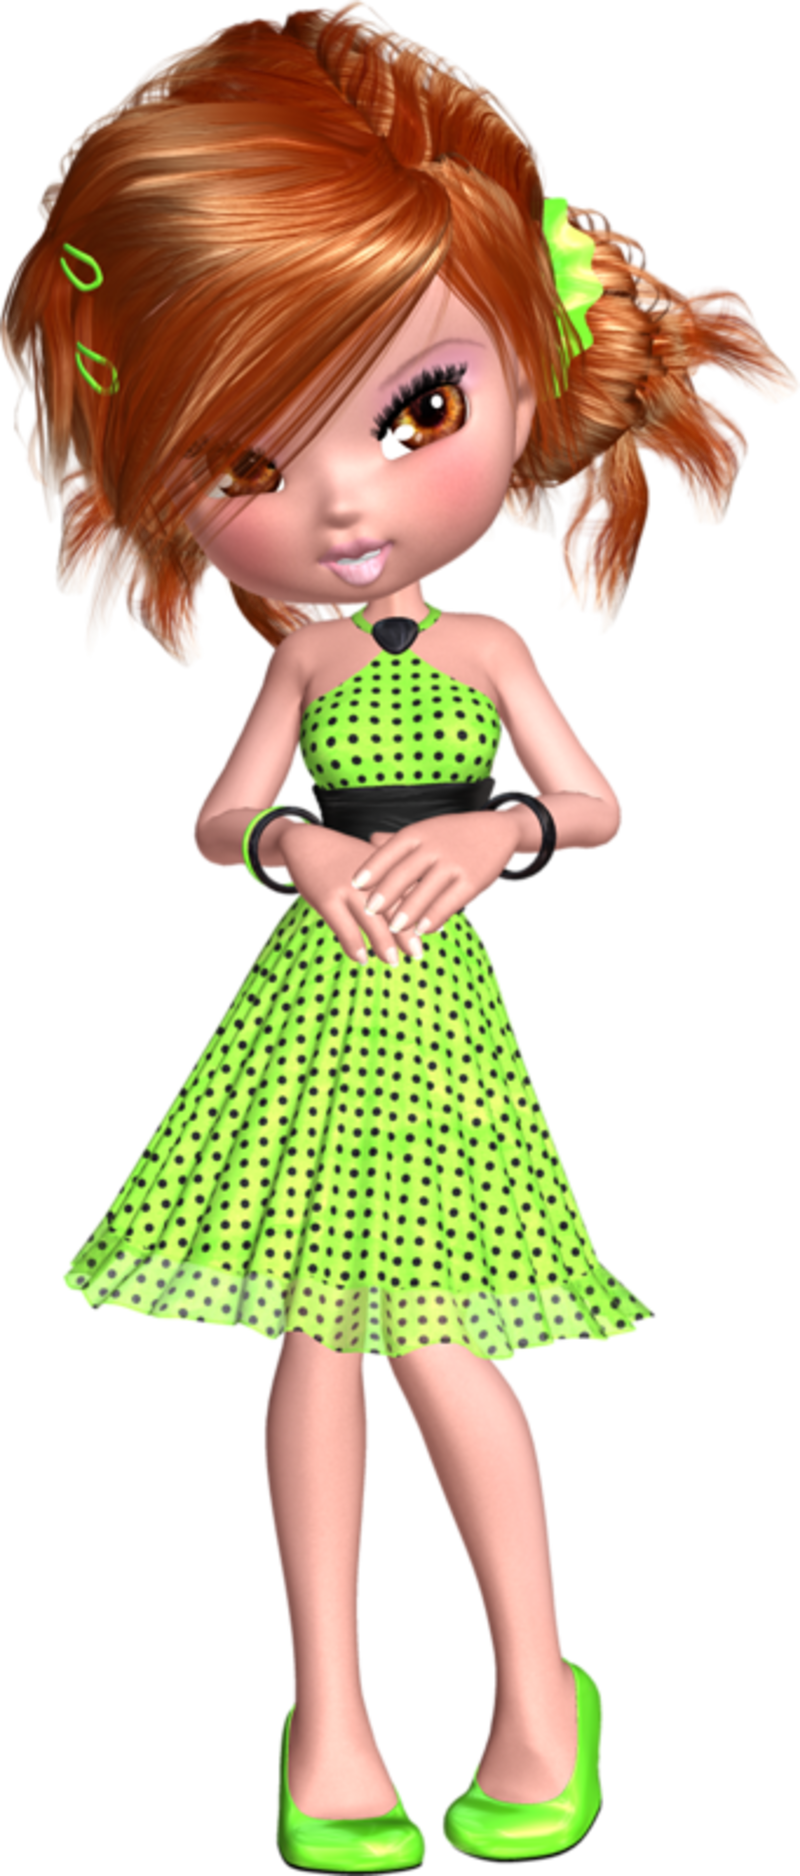 580d4616.png Poser Coocie PNGTube Pinterest Dolls